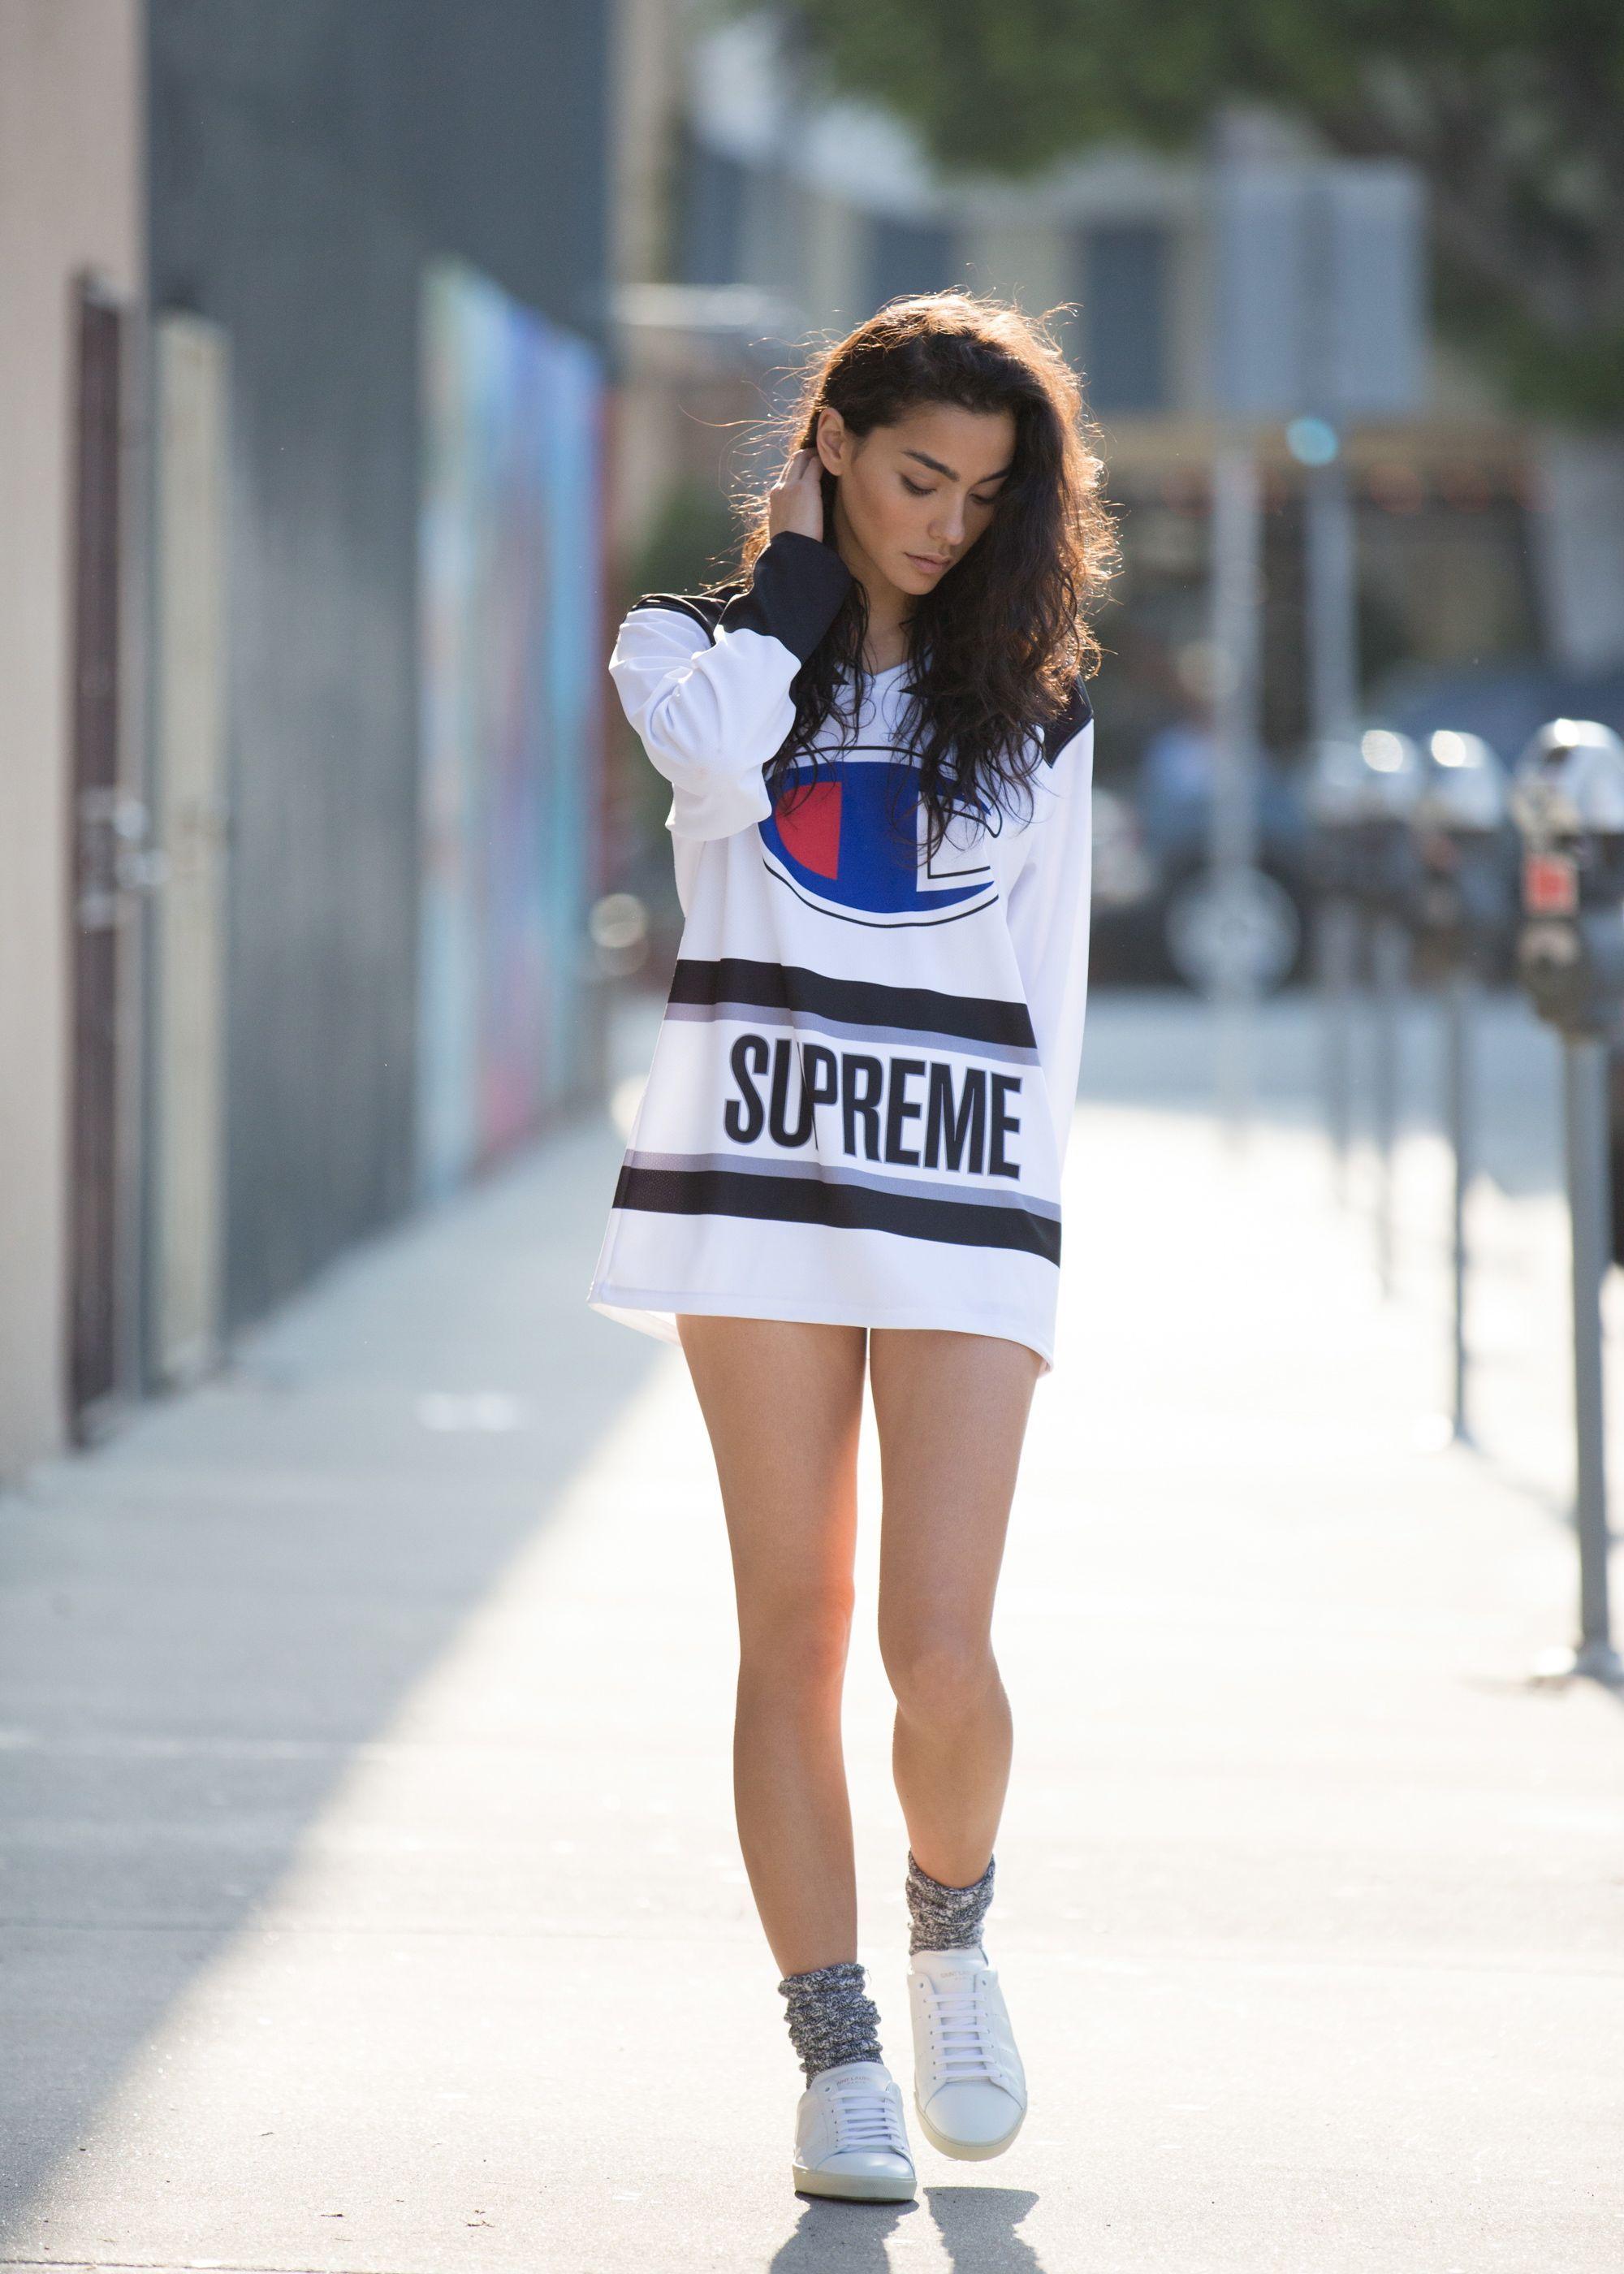 adrianneho champion x supreme  streetwear fashion women